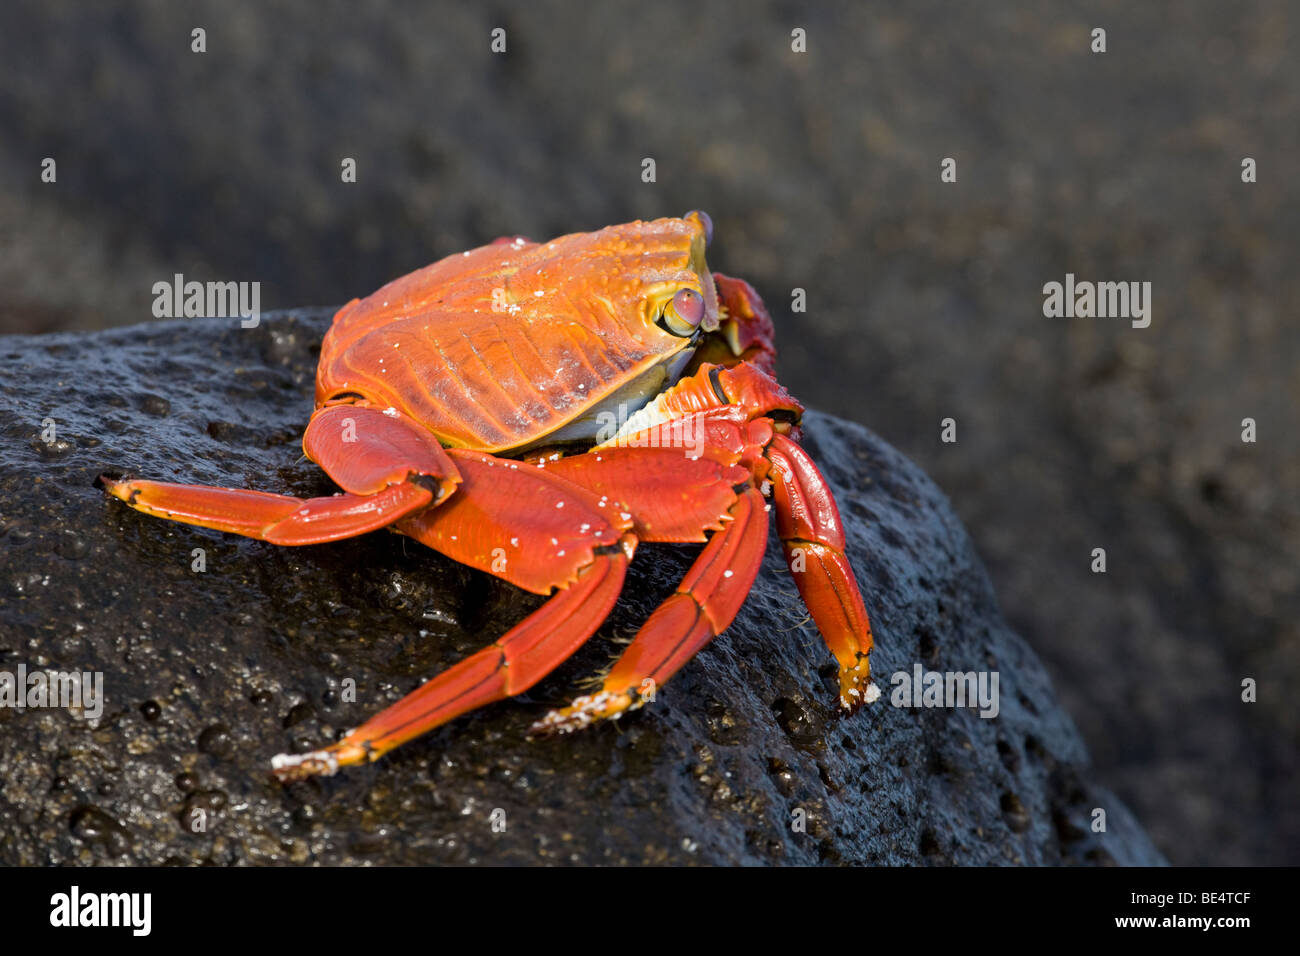 Sally Lightfoot Crab (Grapsus grapsus) on black lava rock in Galapagos National Park - Stock Image